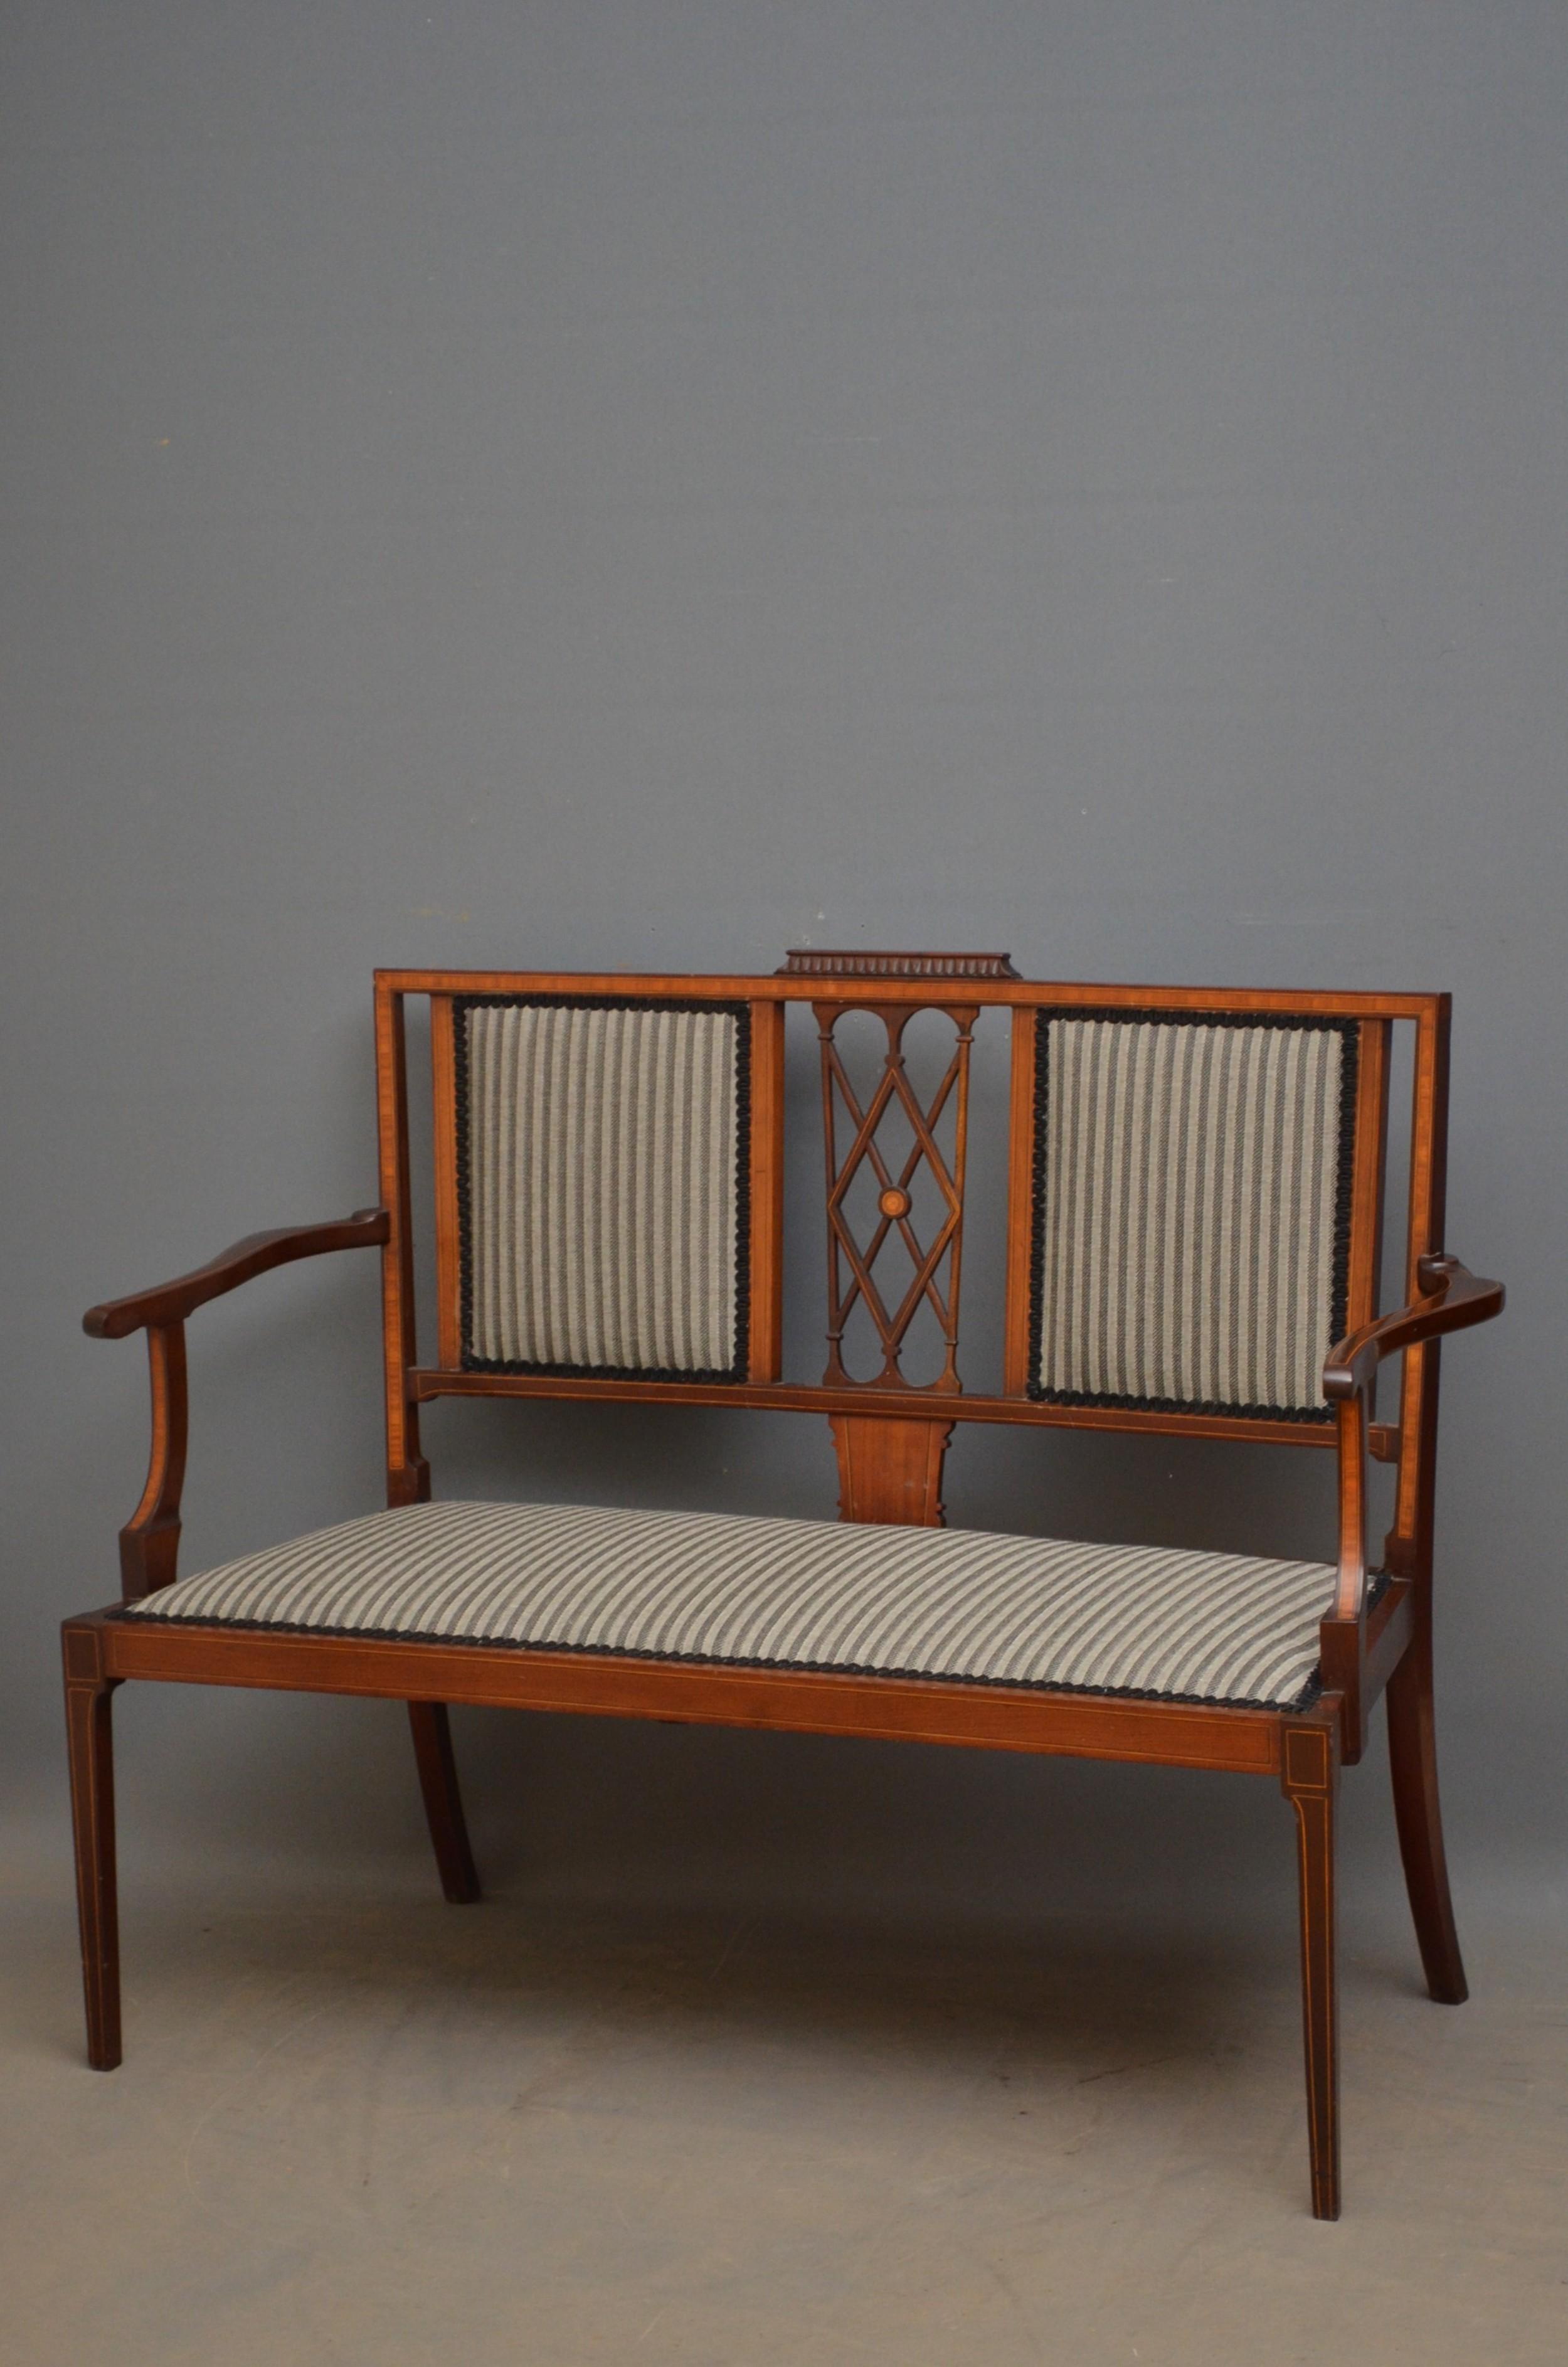 edwardian mahogany and inlaid settee